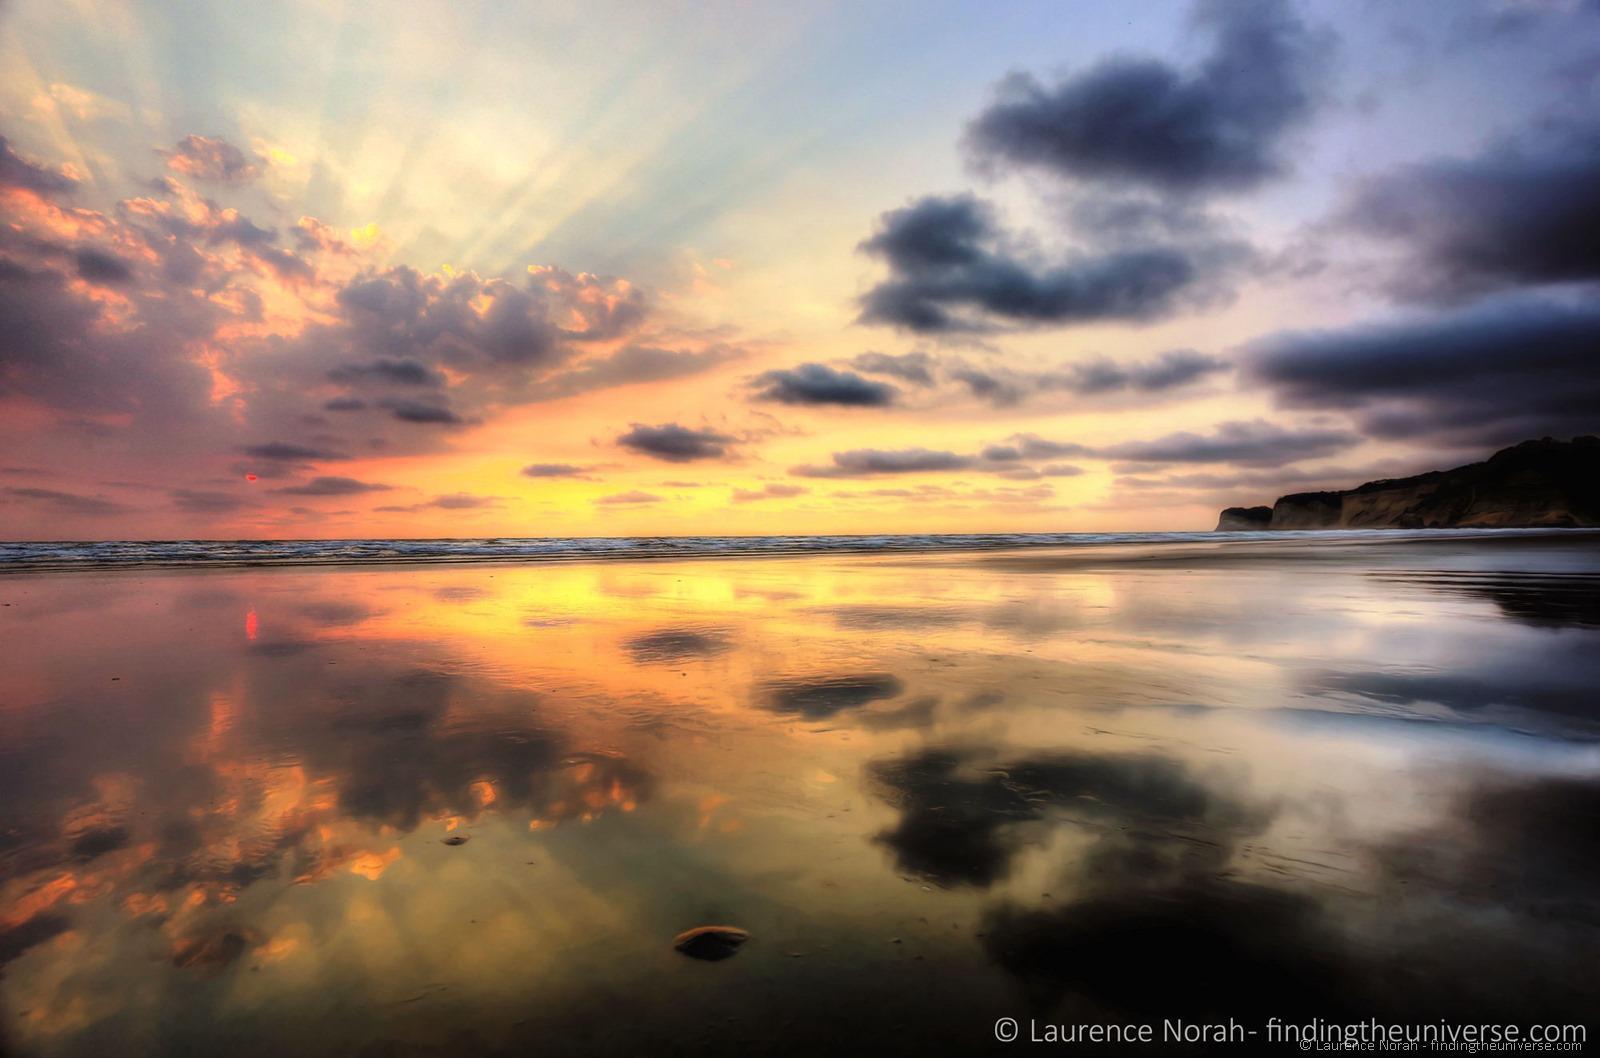 Canoa tramonto 2 in scala